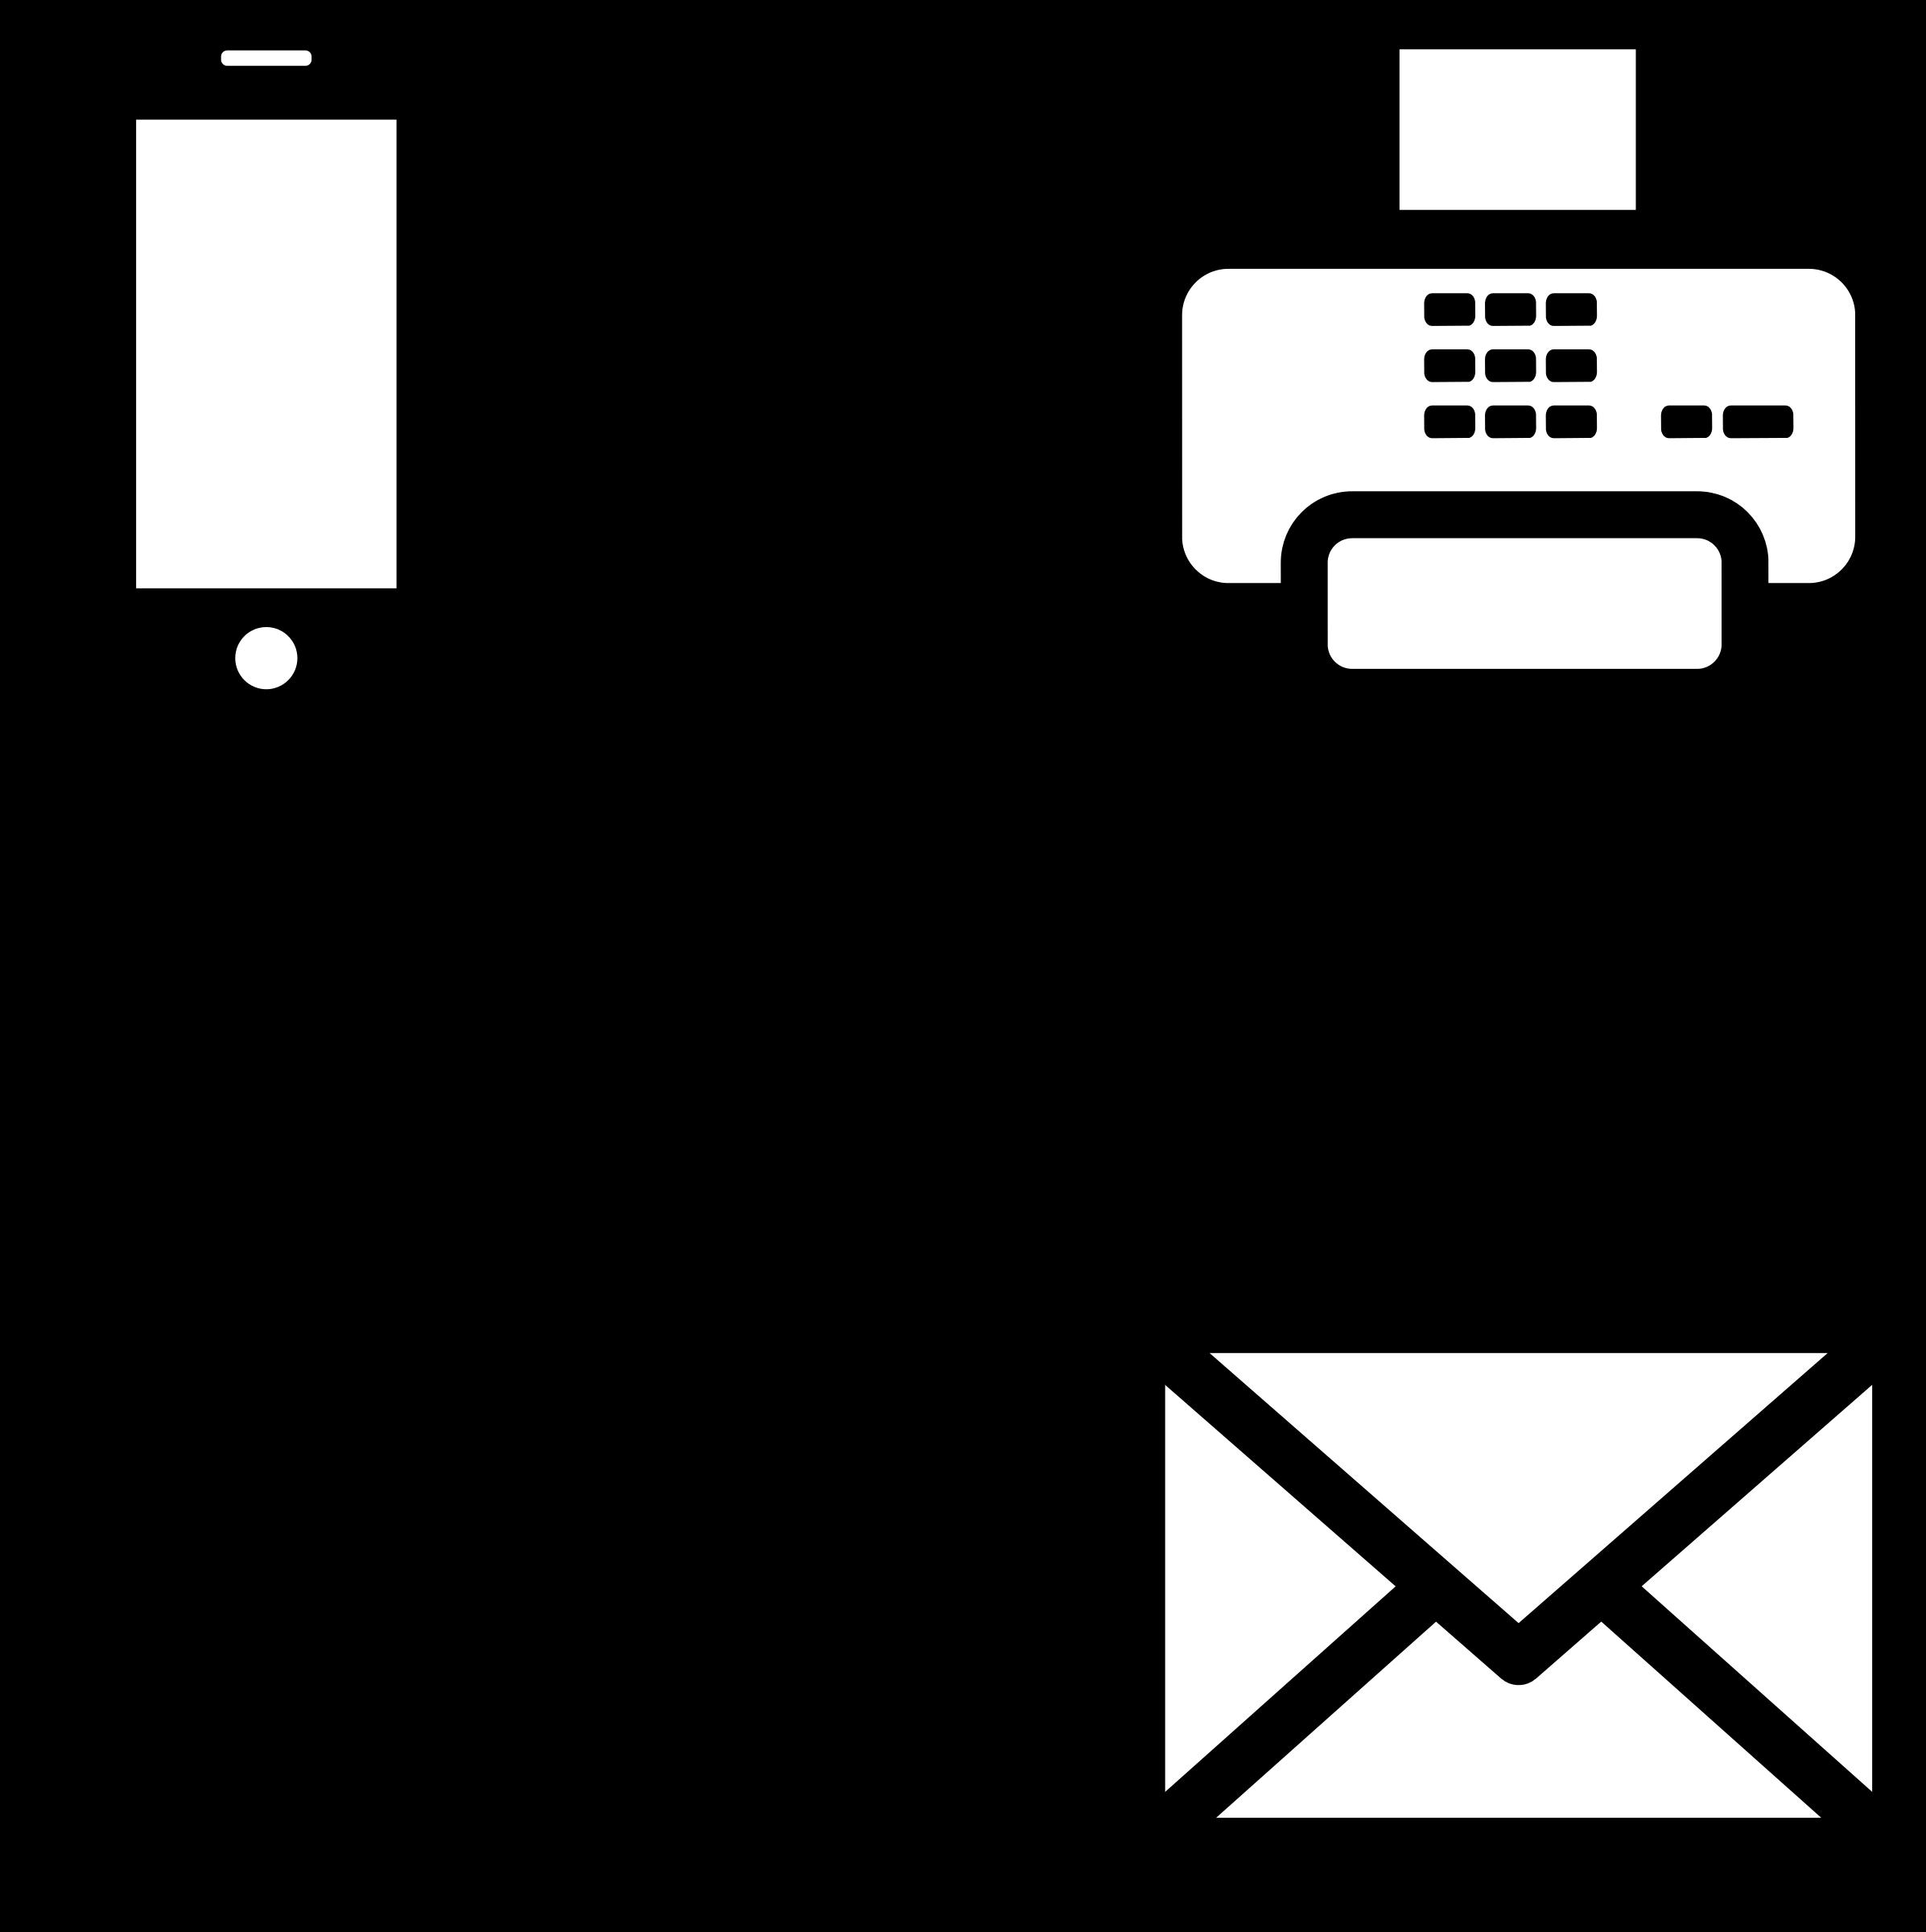 Fax Logo Clipart.